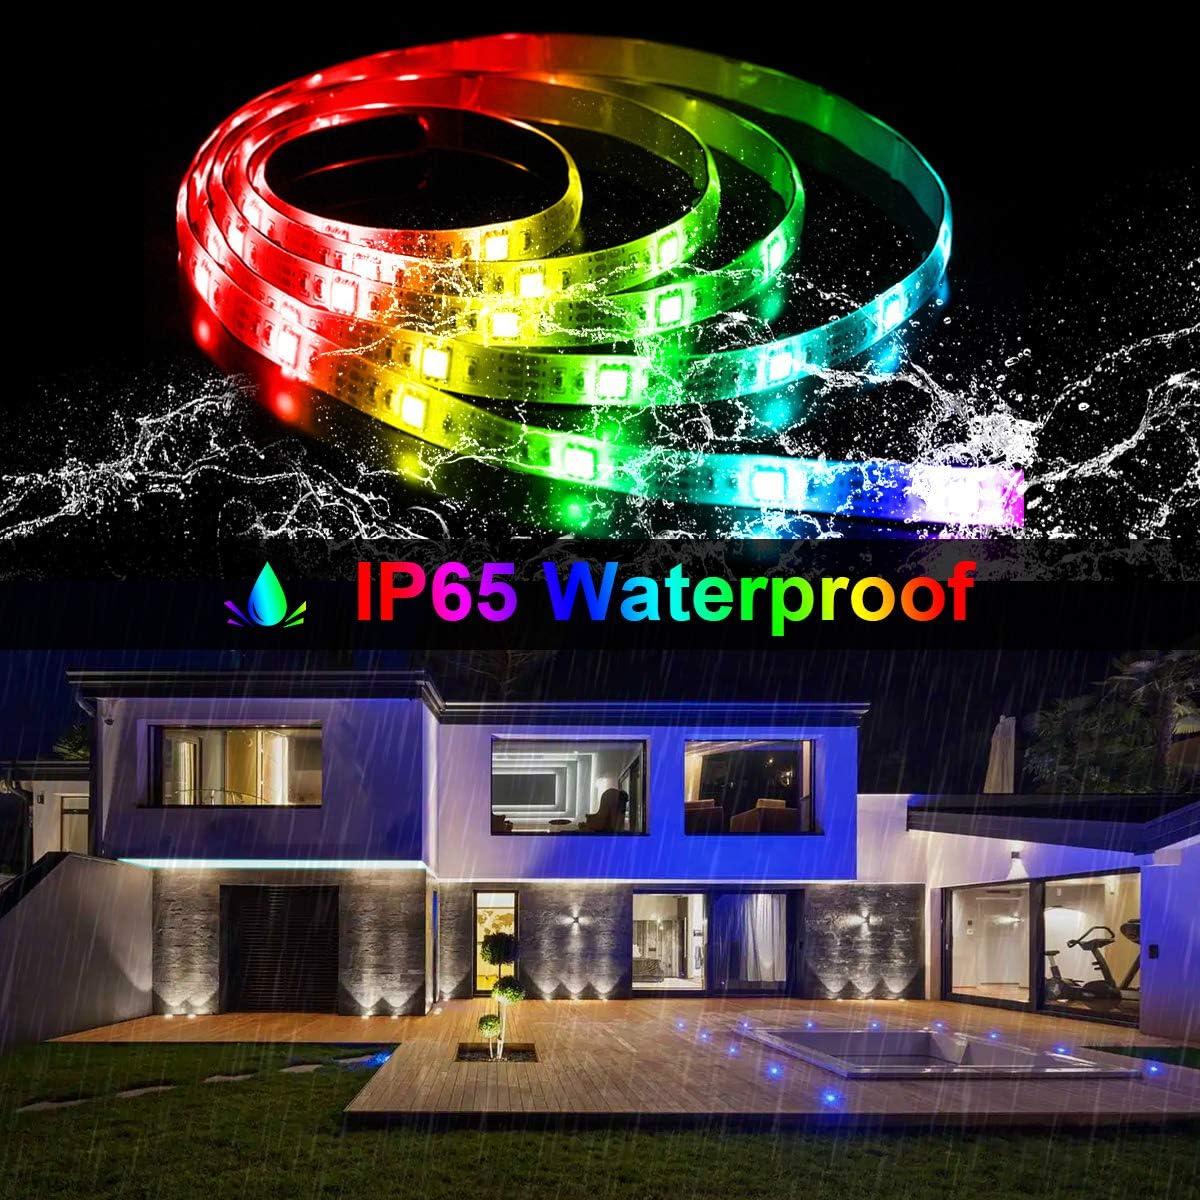 Bedroom Decor Led Strip Lights Rope Lights Wall Lights Mixi 16 4ft 150 Lights Waterproof Led Light Strips Color Changing 5050 Rgb With Bluetooth Music Sync App Remote Controller Seasonal Decor Seasonal Lighting